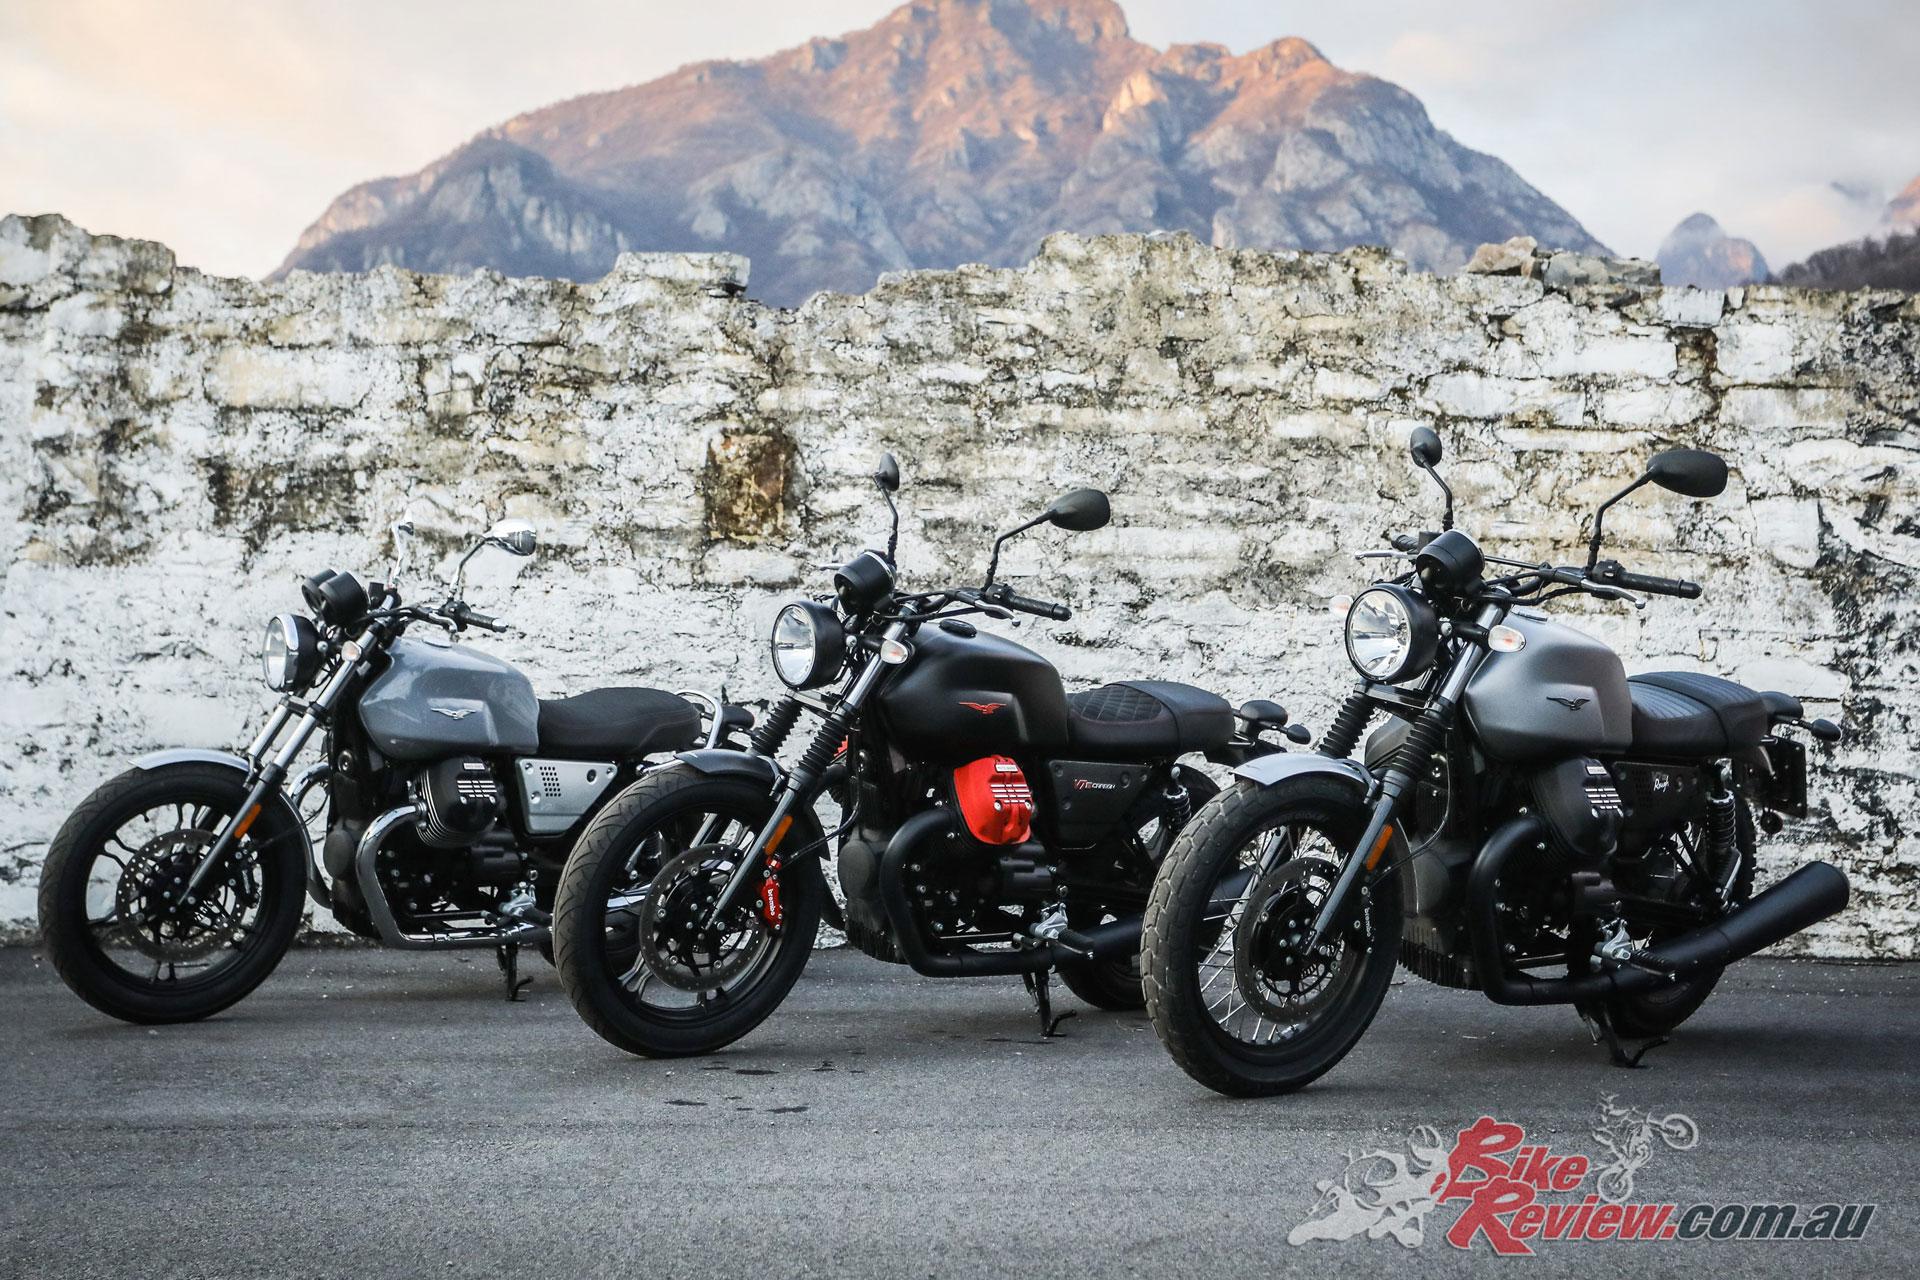 Moto Guzzi V7 III Limited Edition Range - Carbon, Rough, Milano